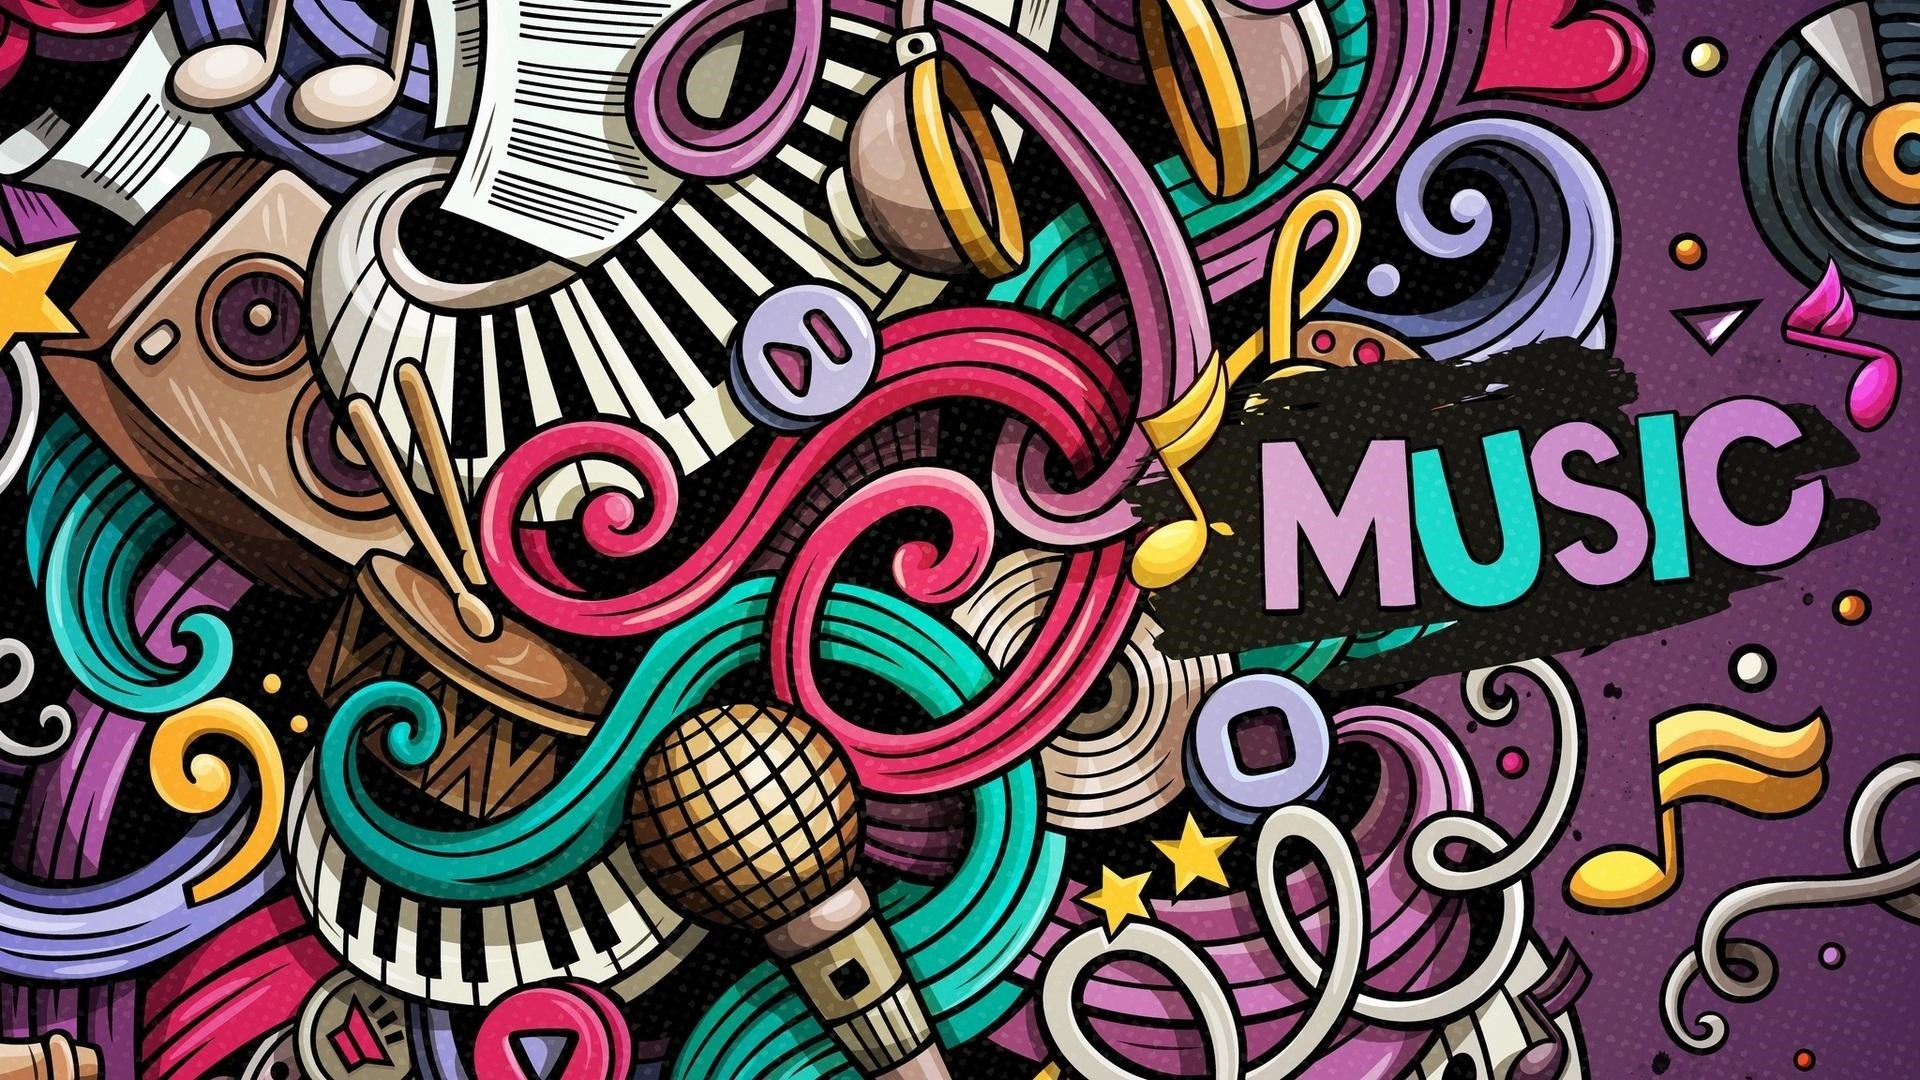 Cute Music 1920x1080 wallpaper